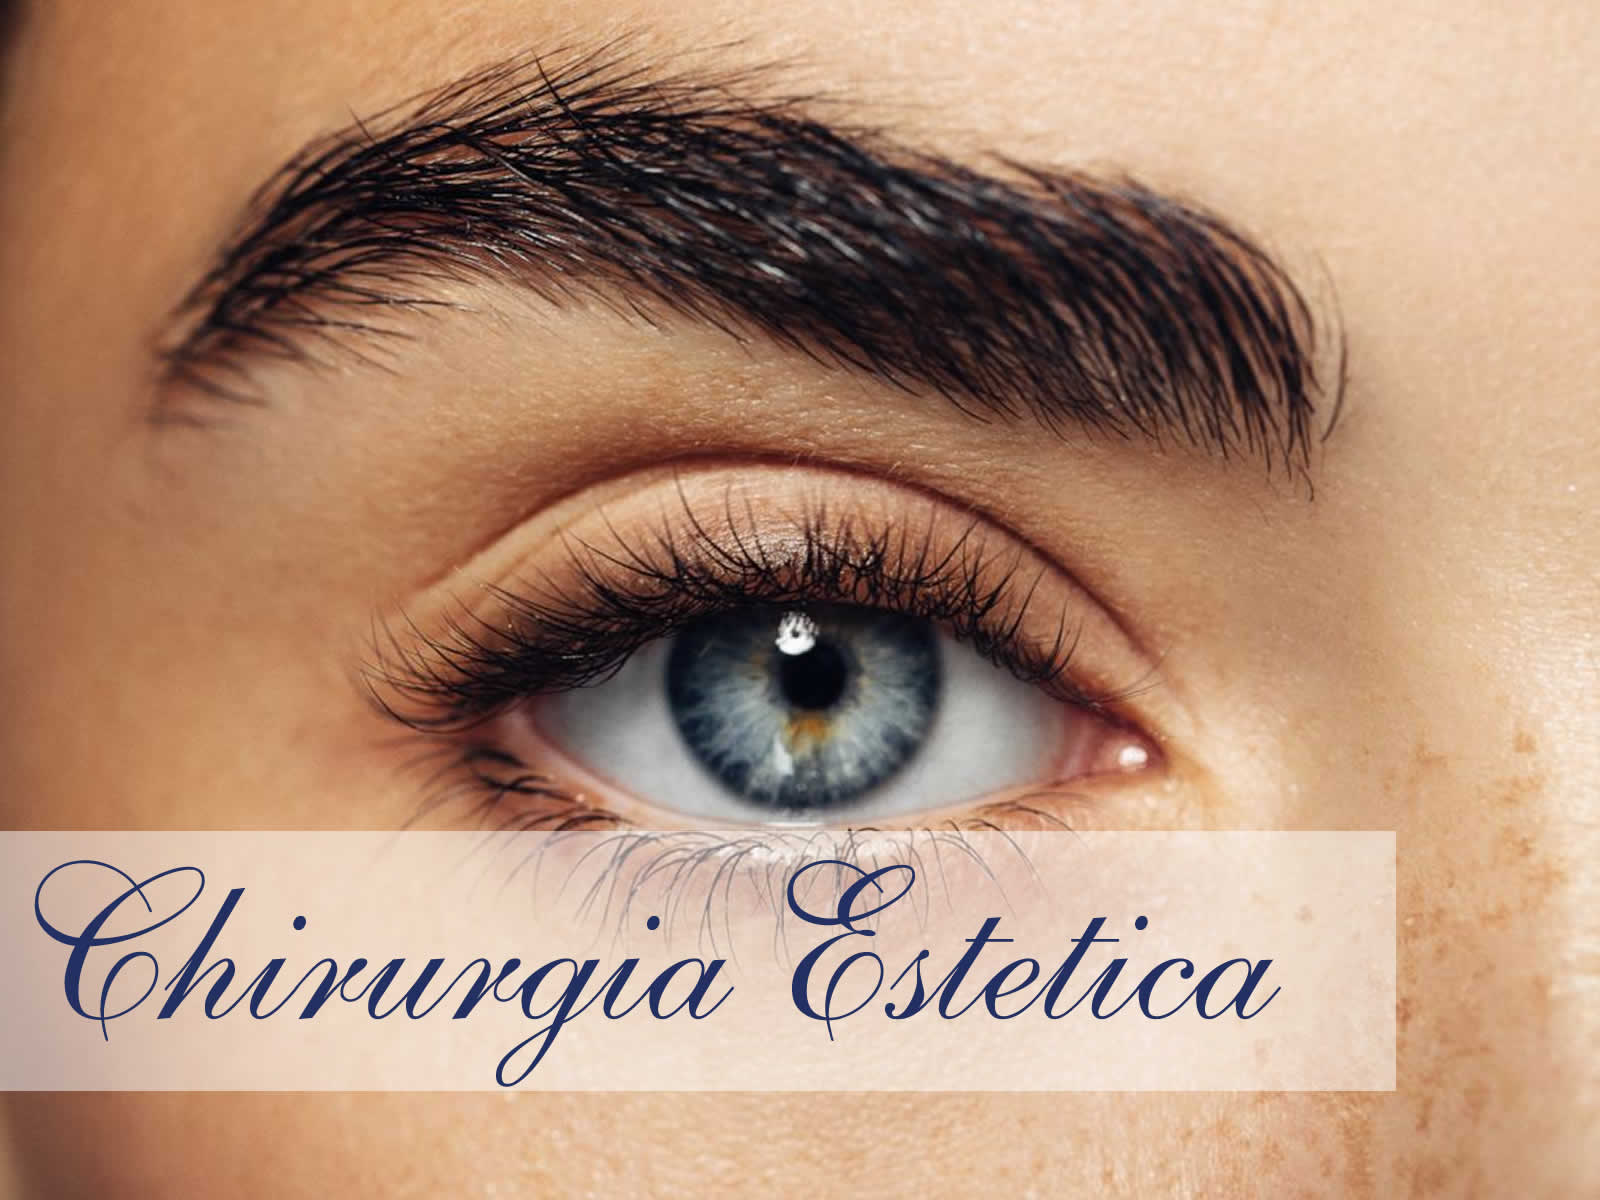 Montecelio - Chirurgo Estetico: Blefaroplastica a Montecelio